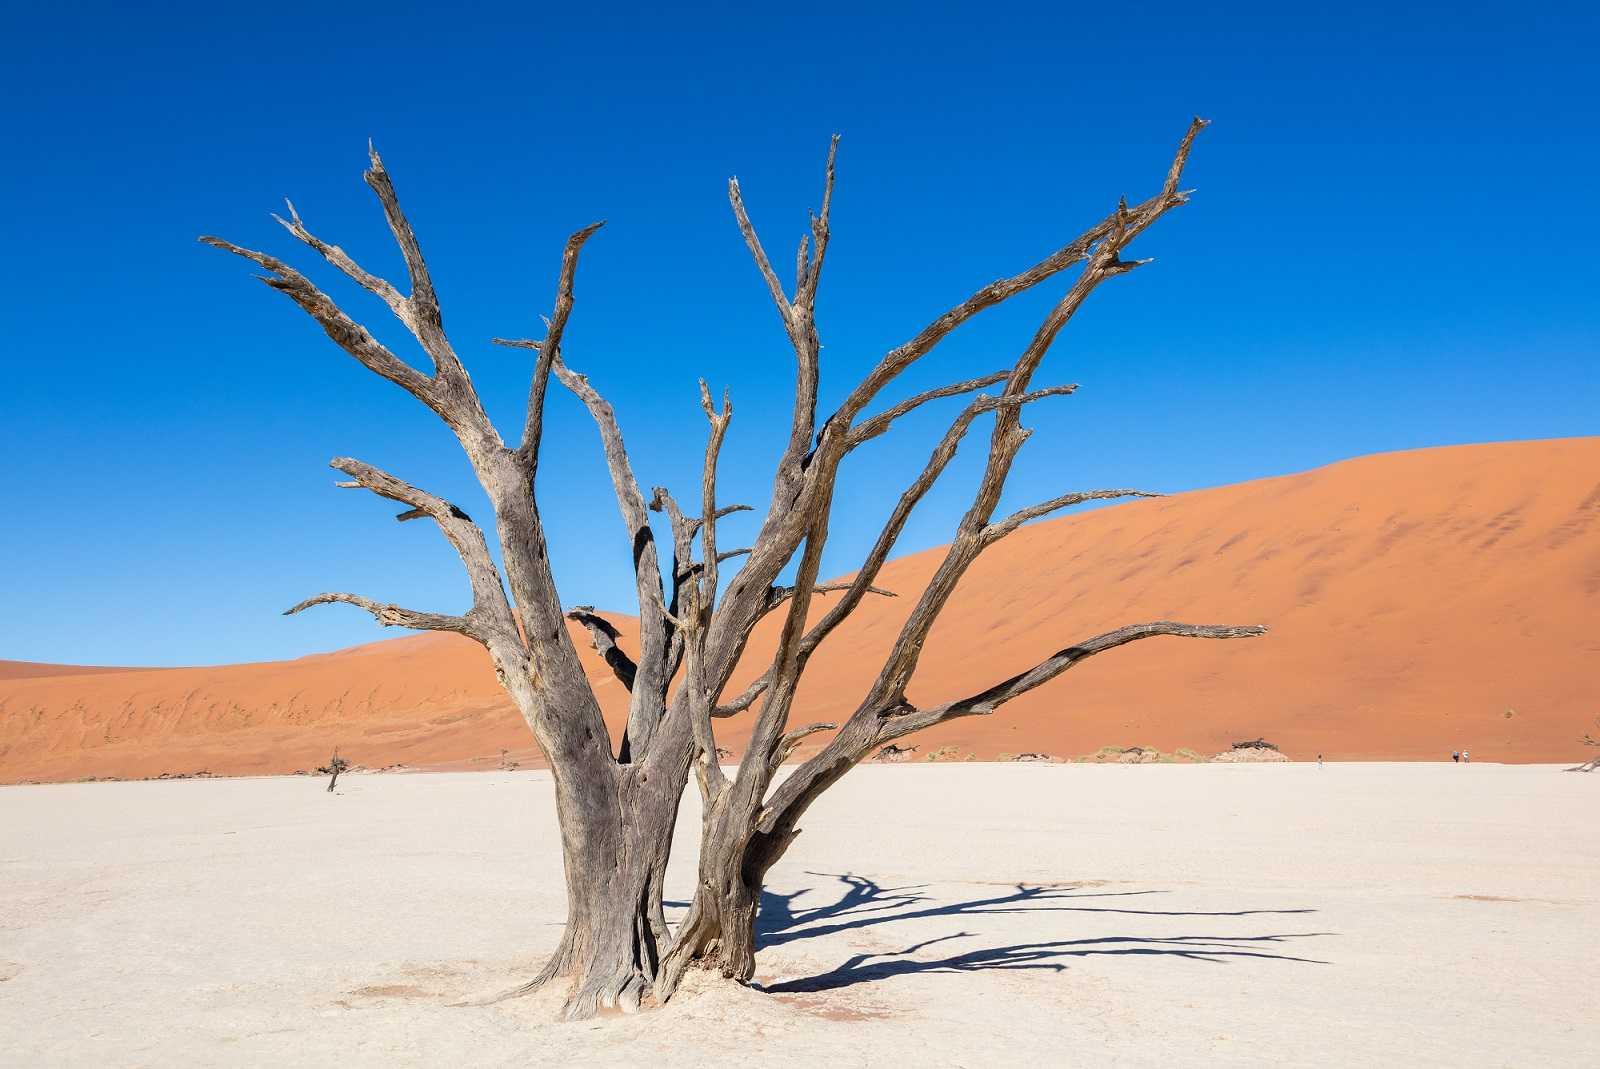 El desierto anaranjado de Namib, en Sossusvlei